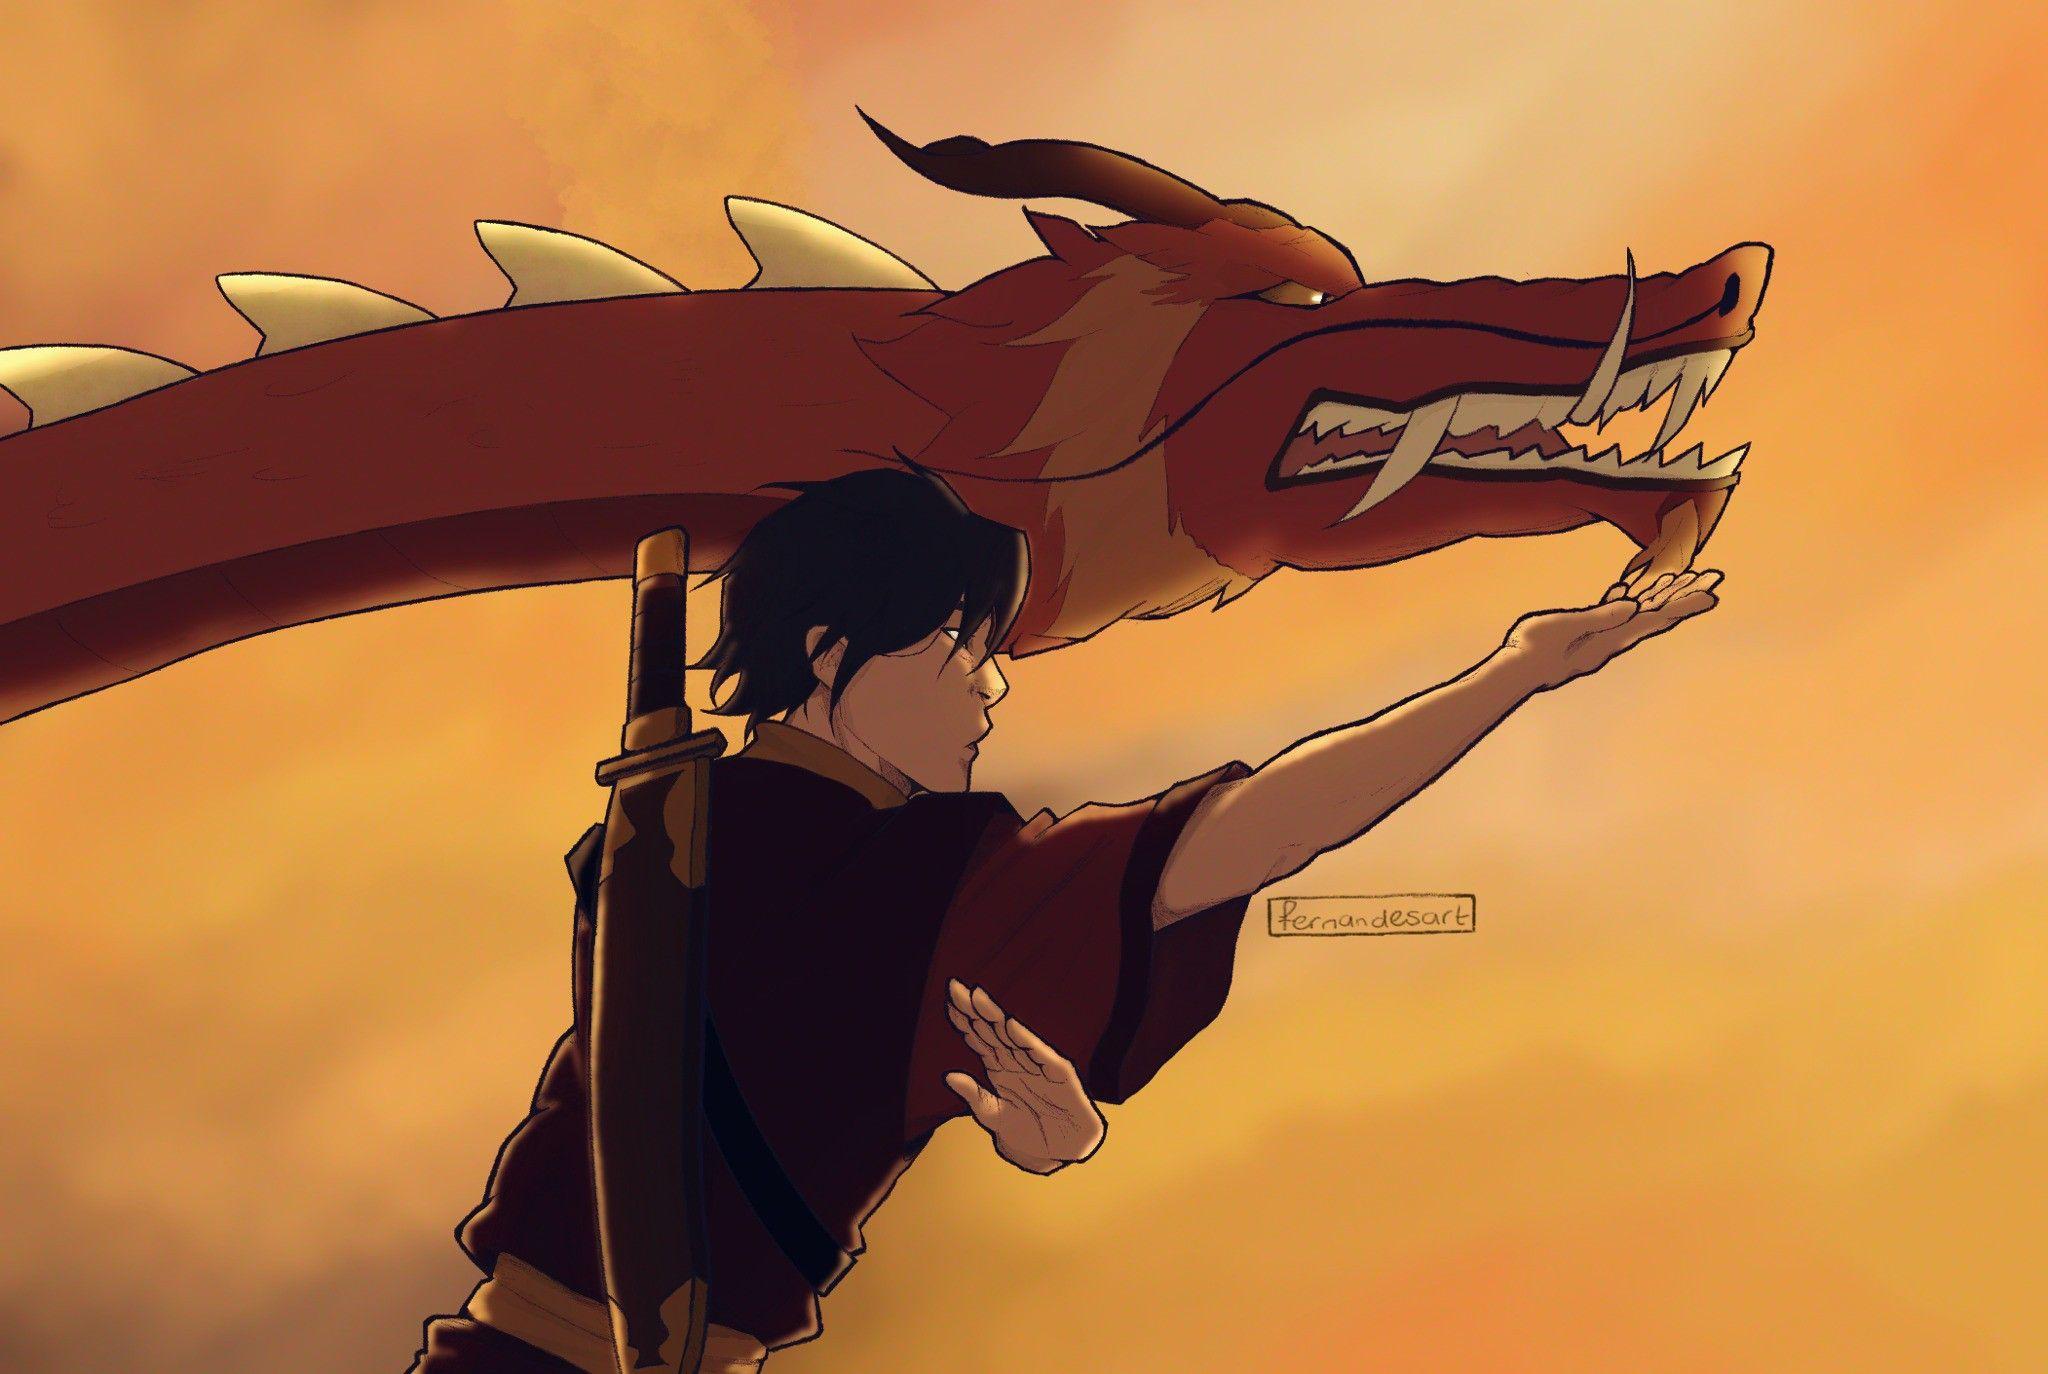 The Dancing Dragon feat. Zuko in 2020 The last avatar